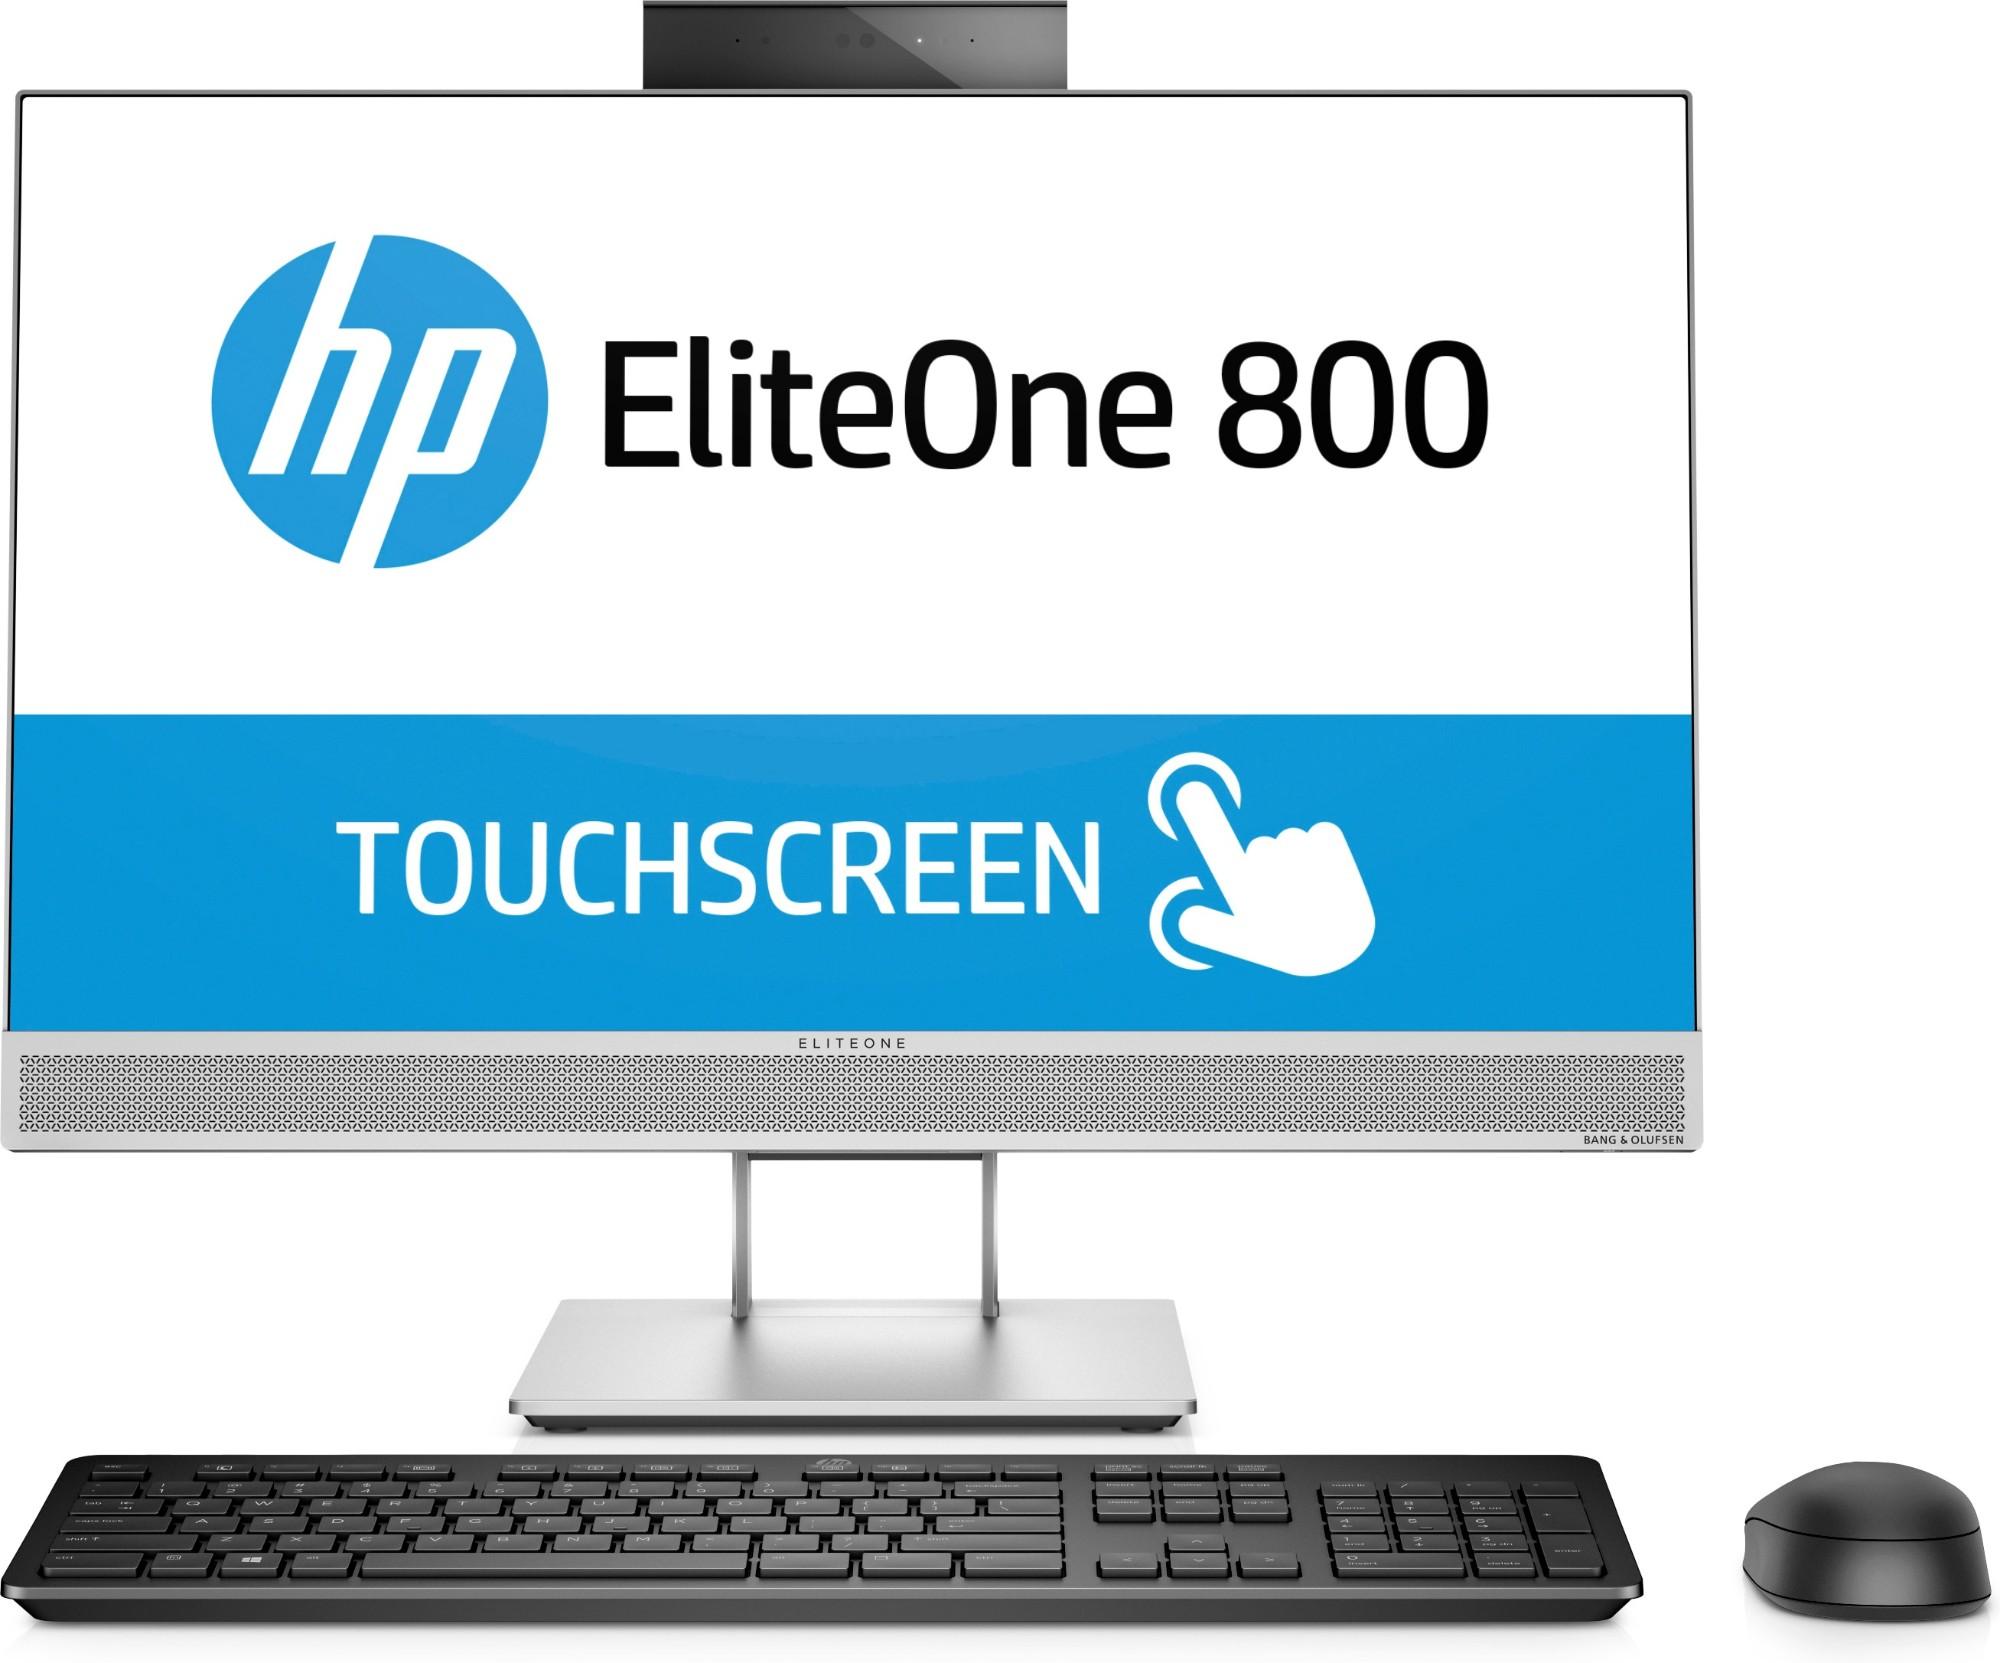 HP EliteOne 800 G4 3GHz i5-8500 8th gen Intel® Core™ i5 23.8